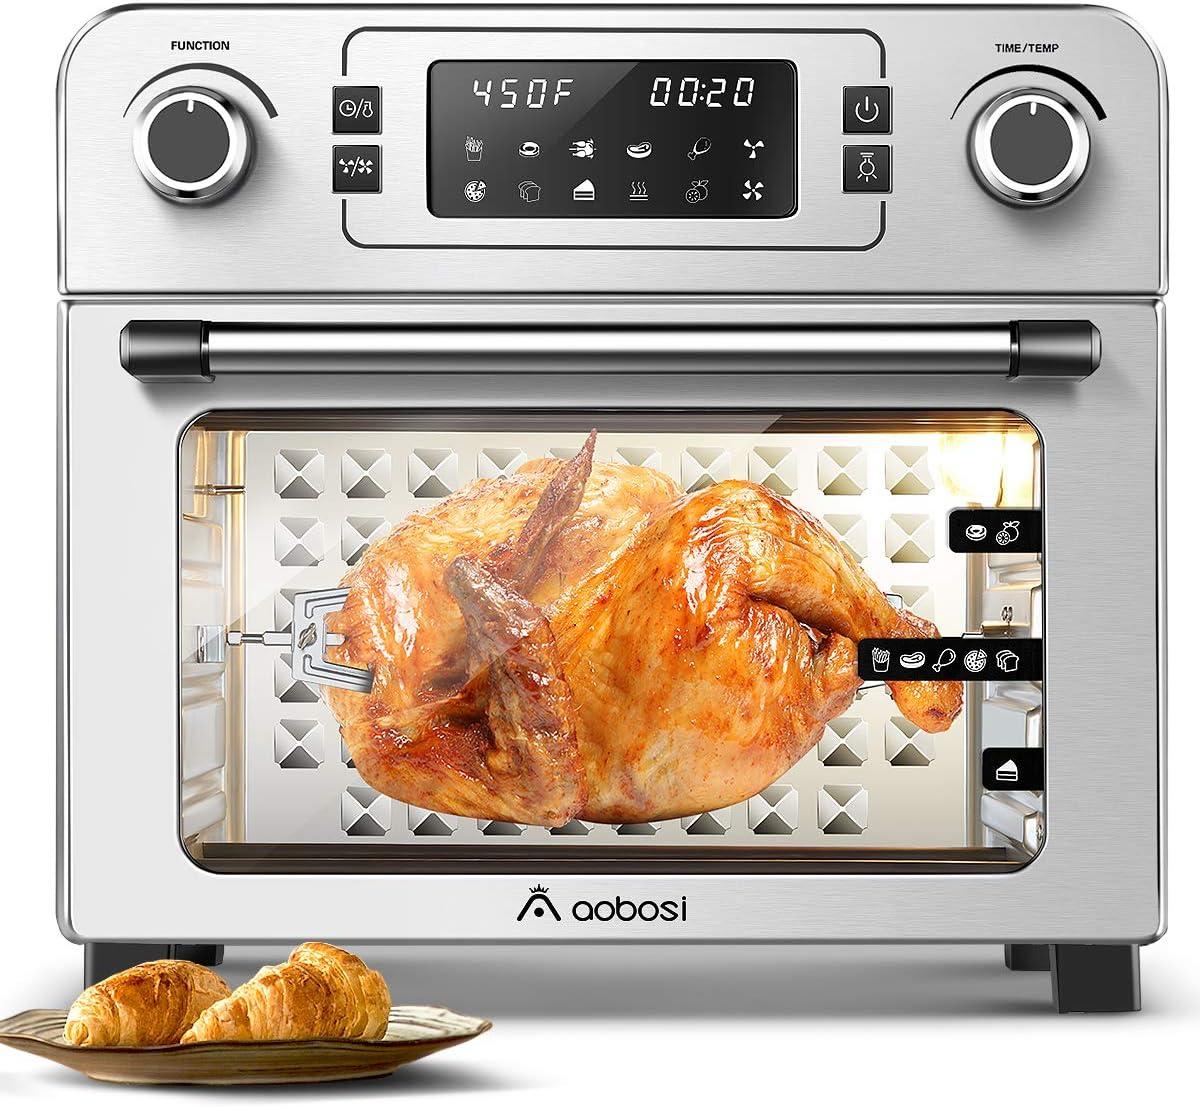 Aobosi Toaster Oven Air Fryer Oven Toaster